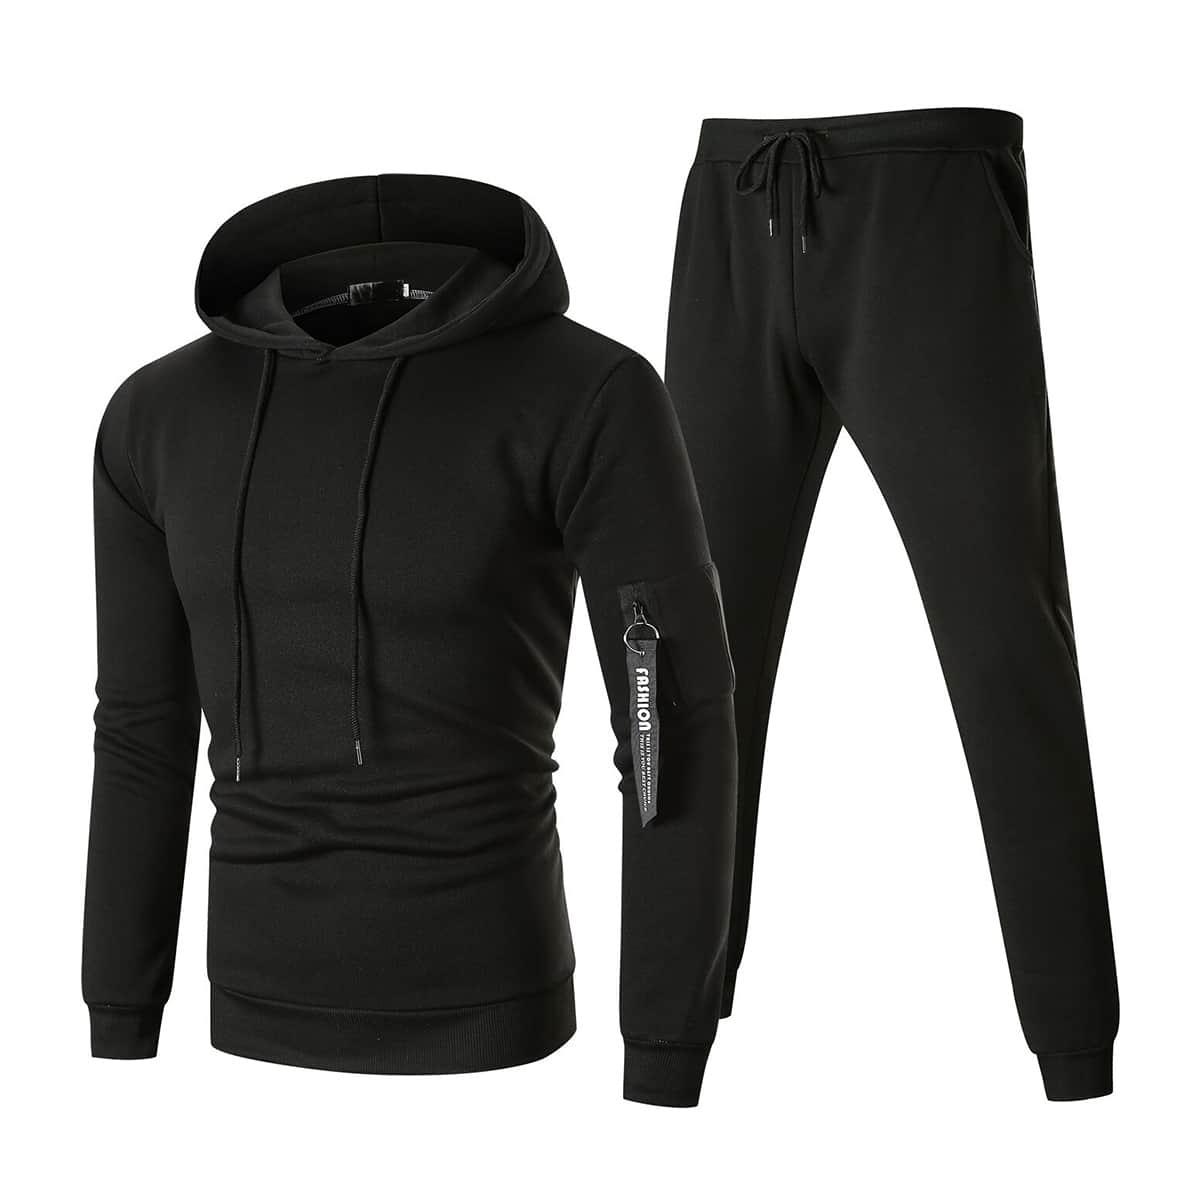 Мужские спортивные брюки и толстовка с молнией от SHEIN